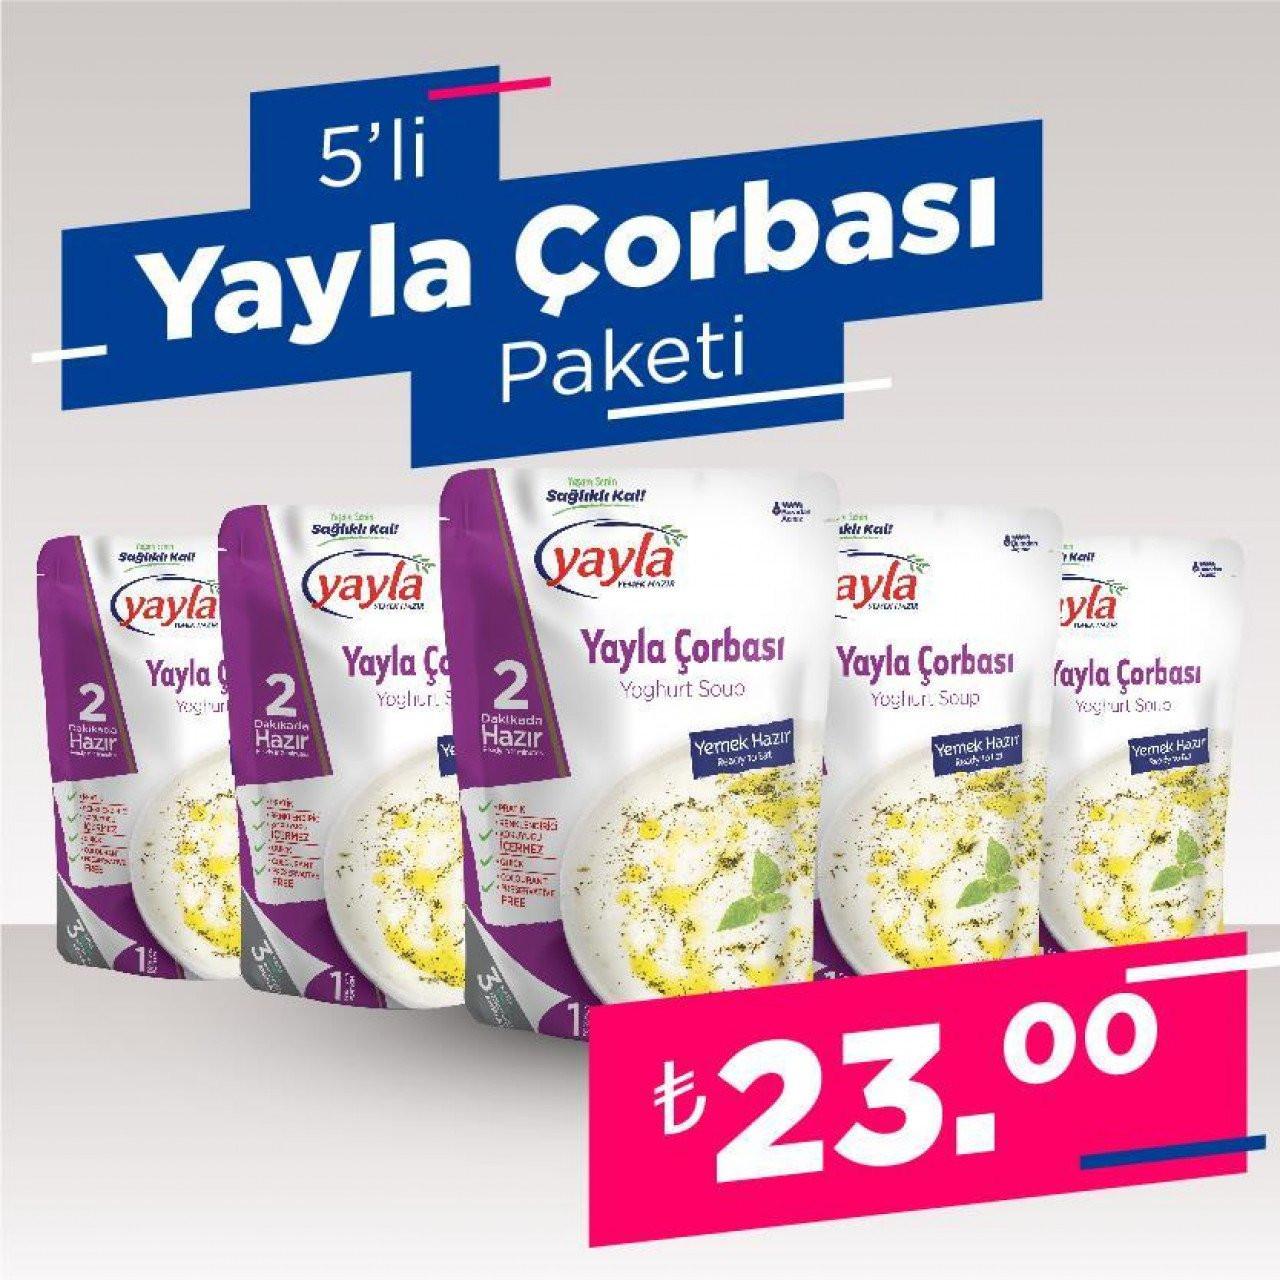 5'Li Yayla Çorbası Paketi